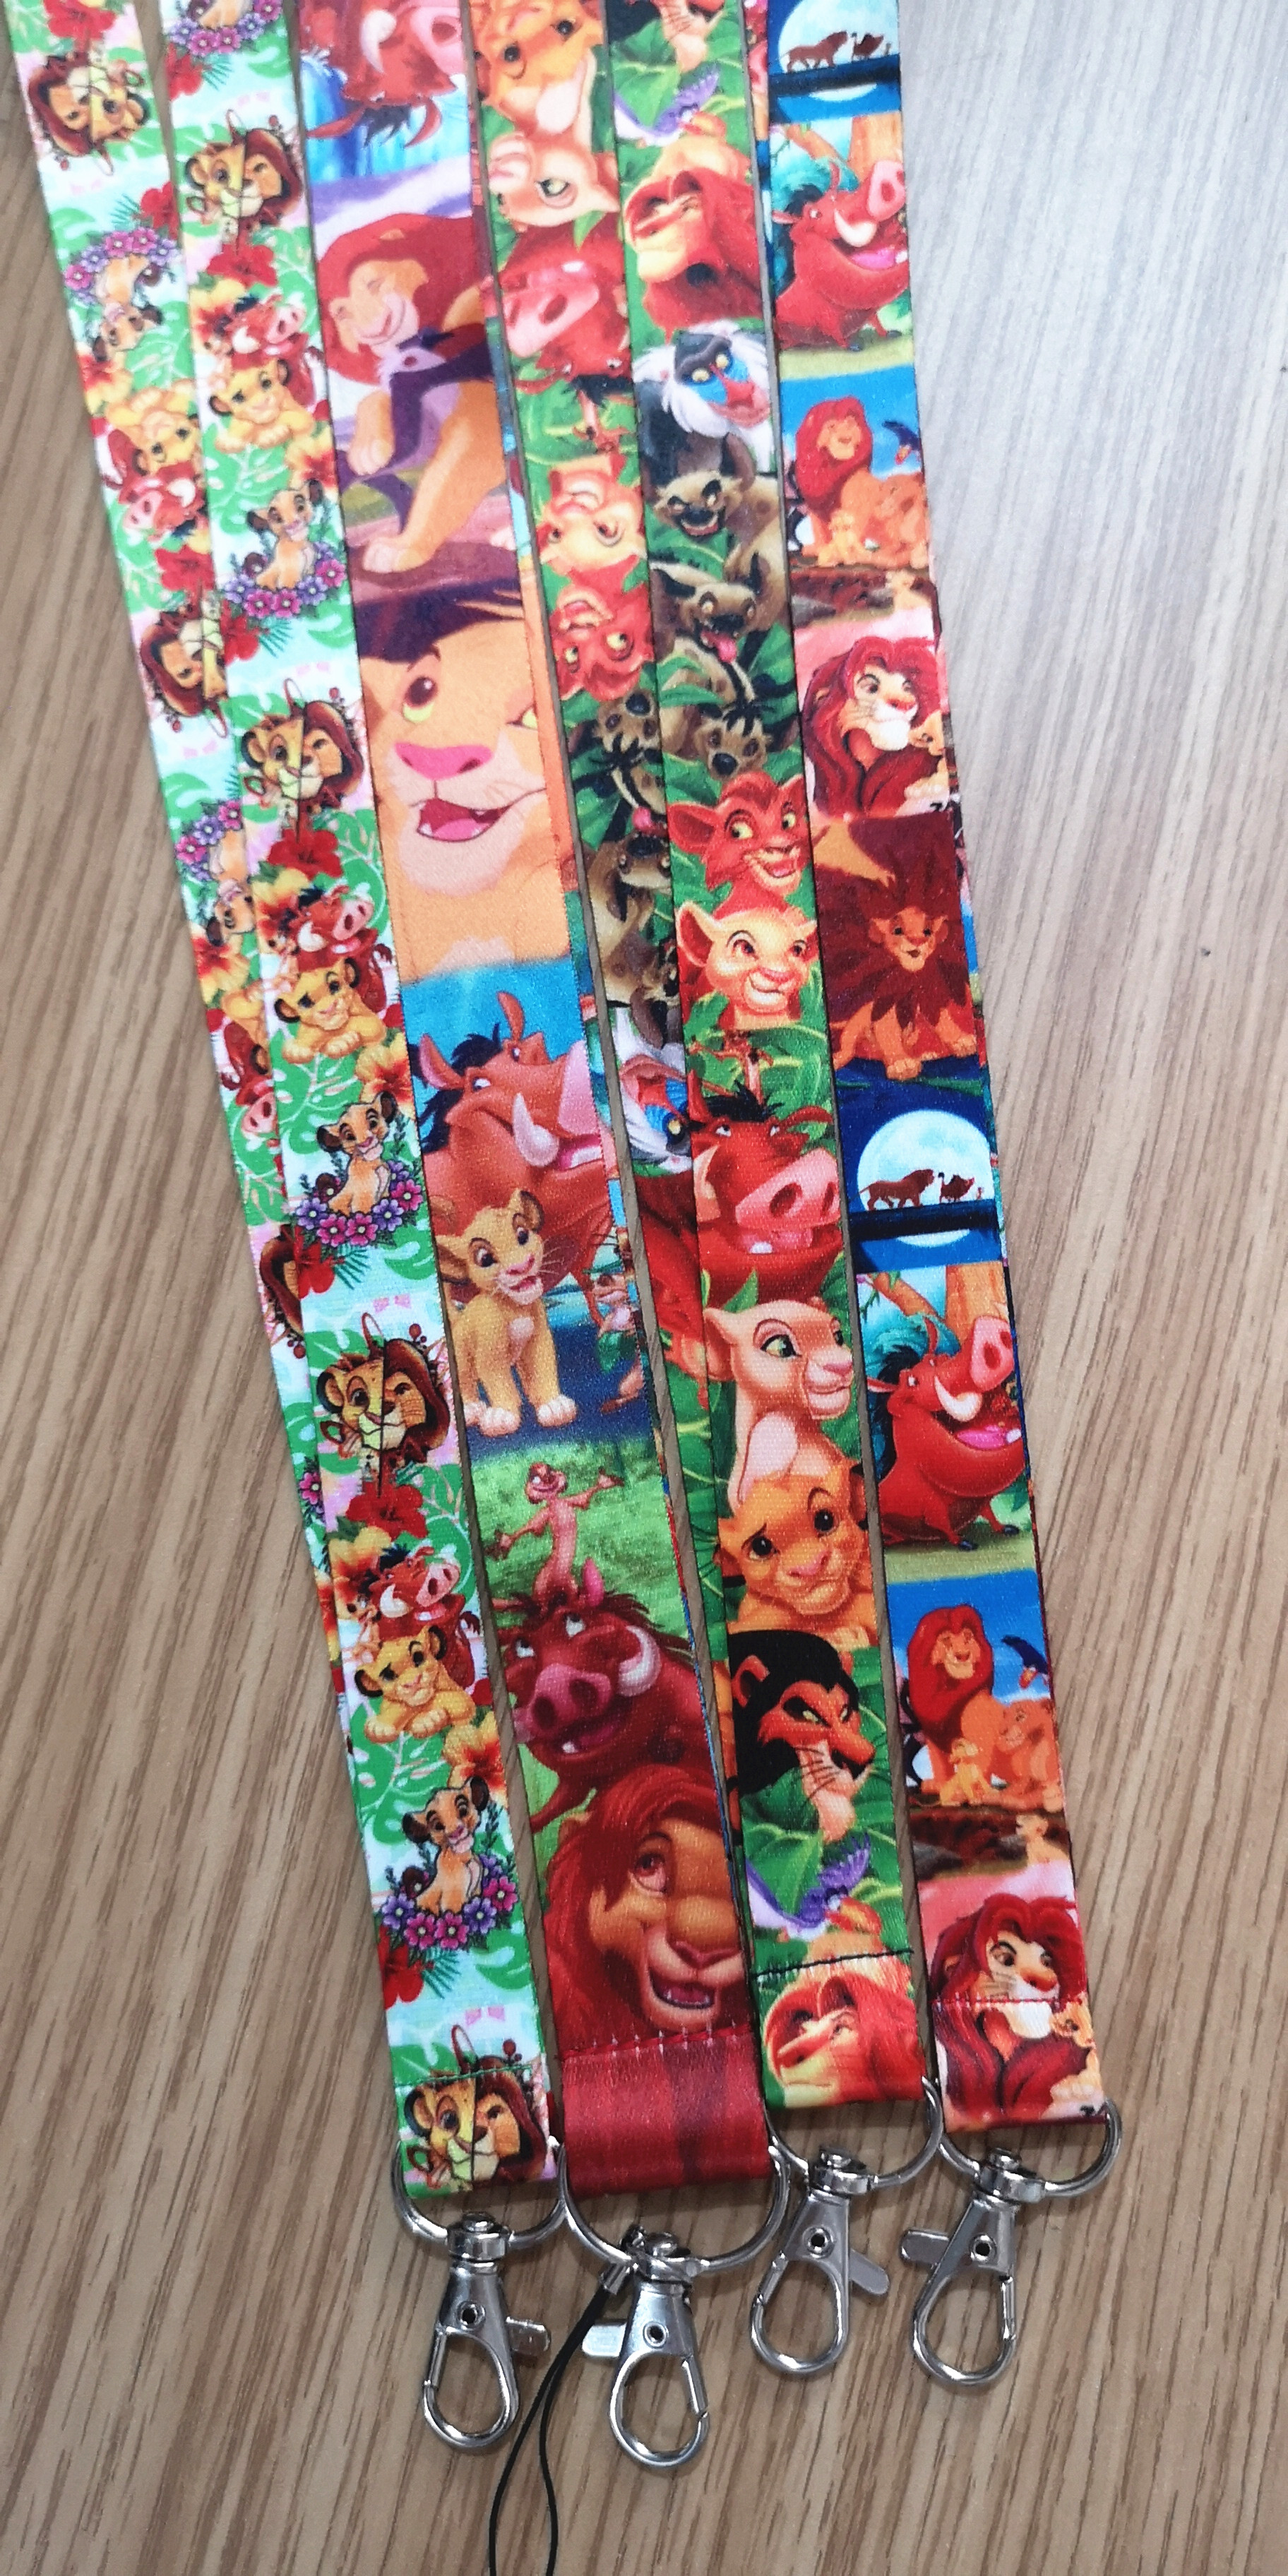 Lot 10Pcs/50Pcs/100Pcs Cartoon Lion King Mix Lanyard Neck Strap Lanyard Mobiele Telefoon Sleutel chain Id Badge Sleutelhangers Party Geschenken|Sleutelhangers|   - AliExpress